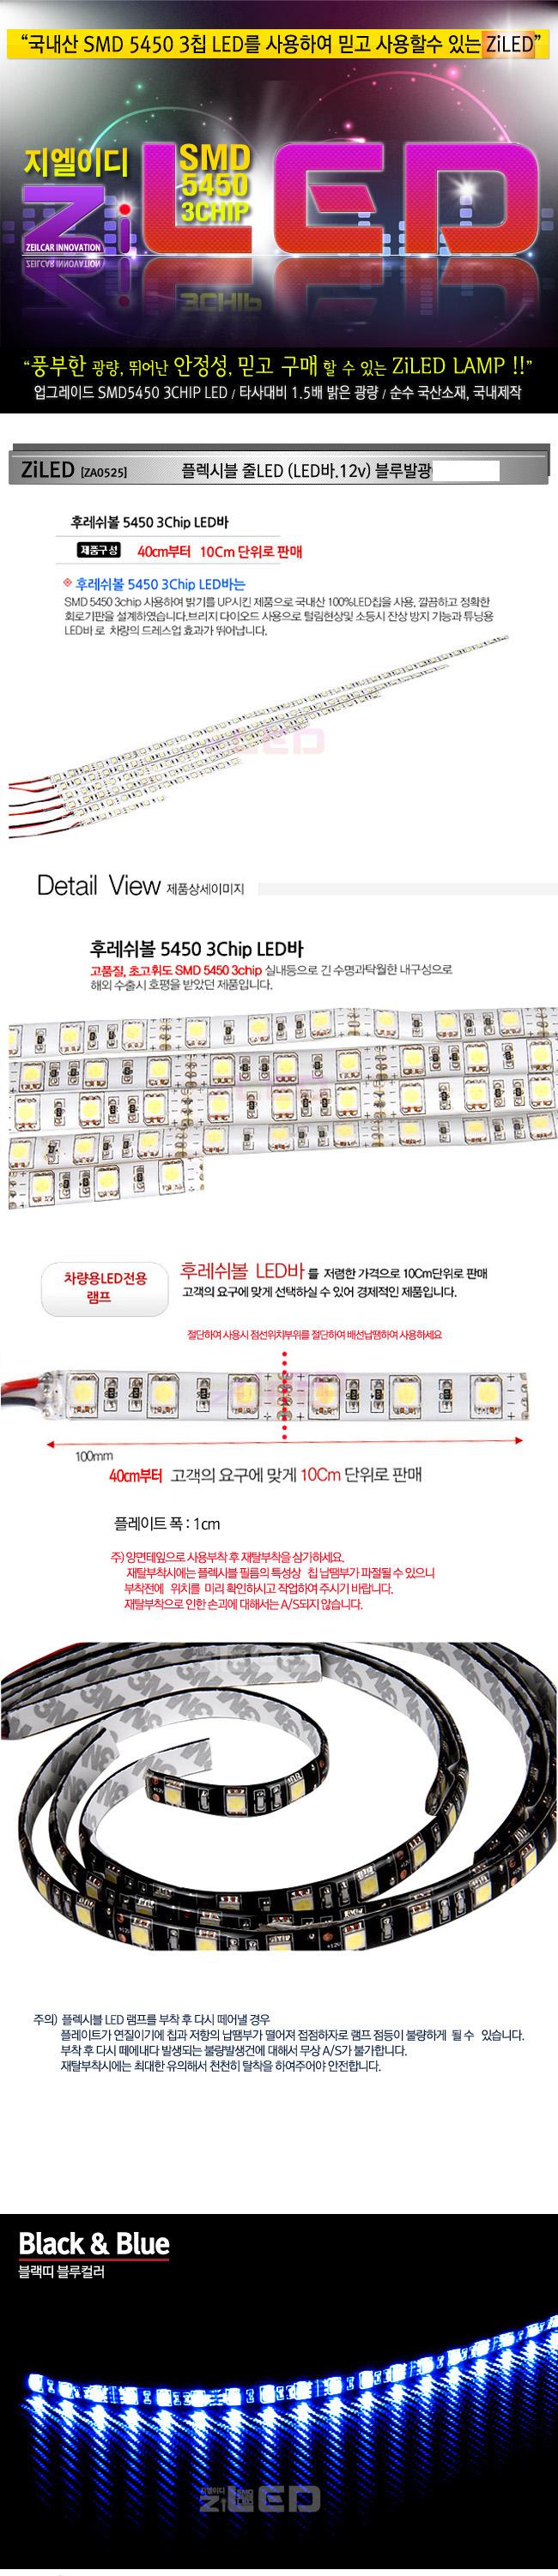 [ZiLED] LED바 SMD5450 3칩, 플렉시블 줄LED (LED바.12V)